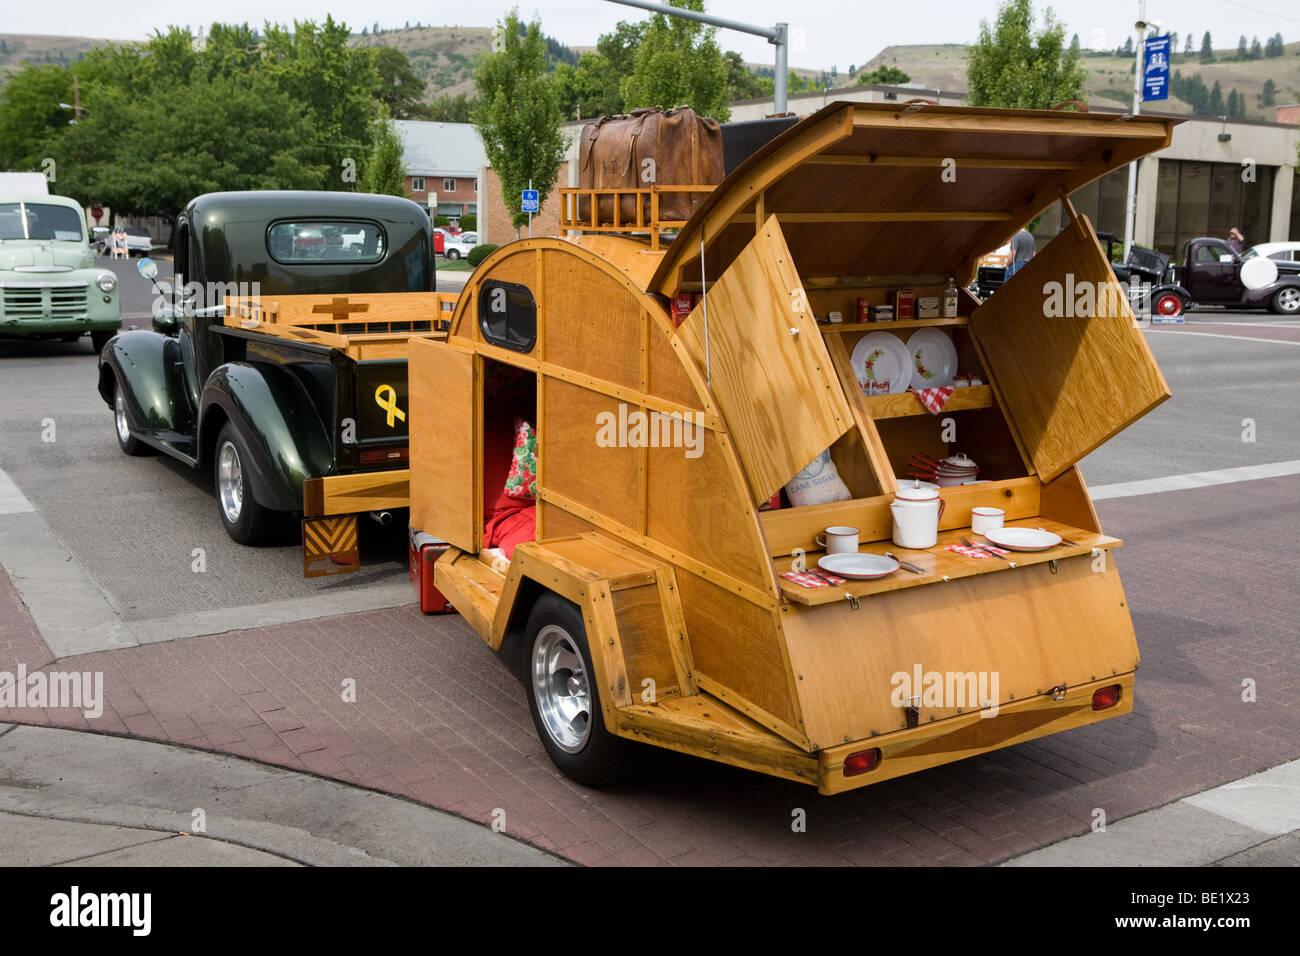 Antique camper at a car show in La Grande Oregon - Stock Image